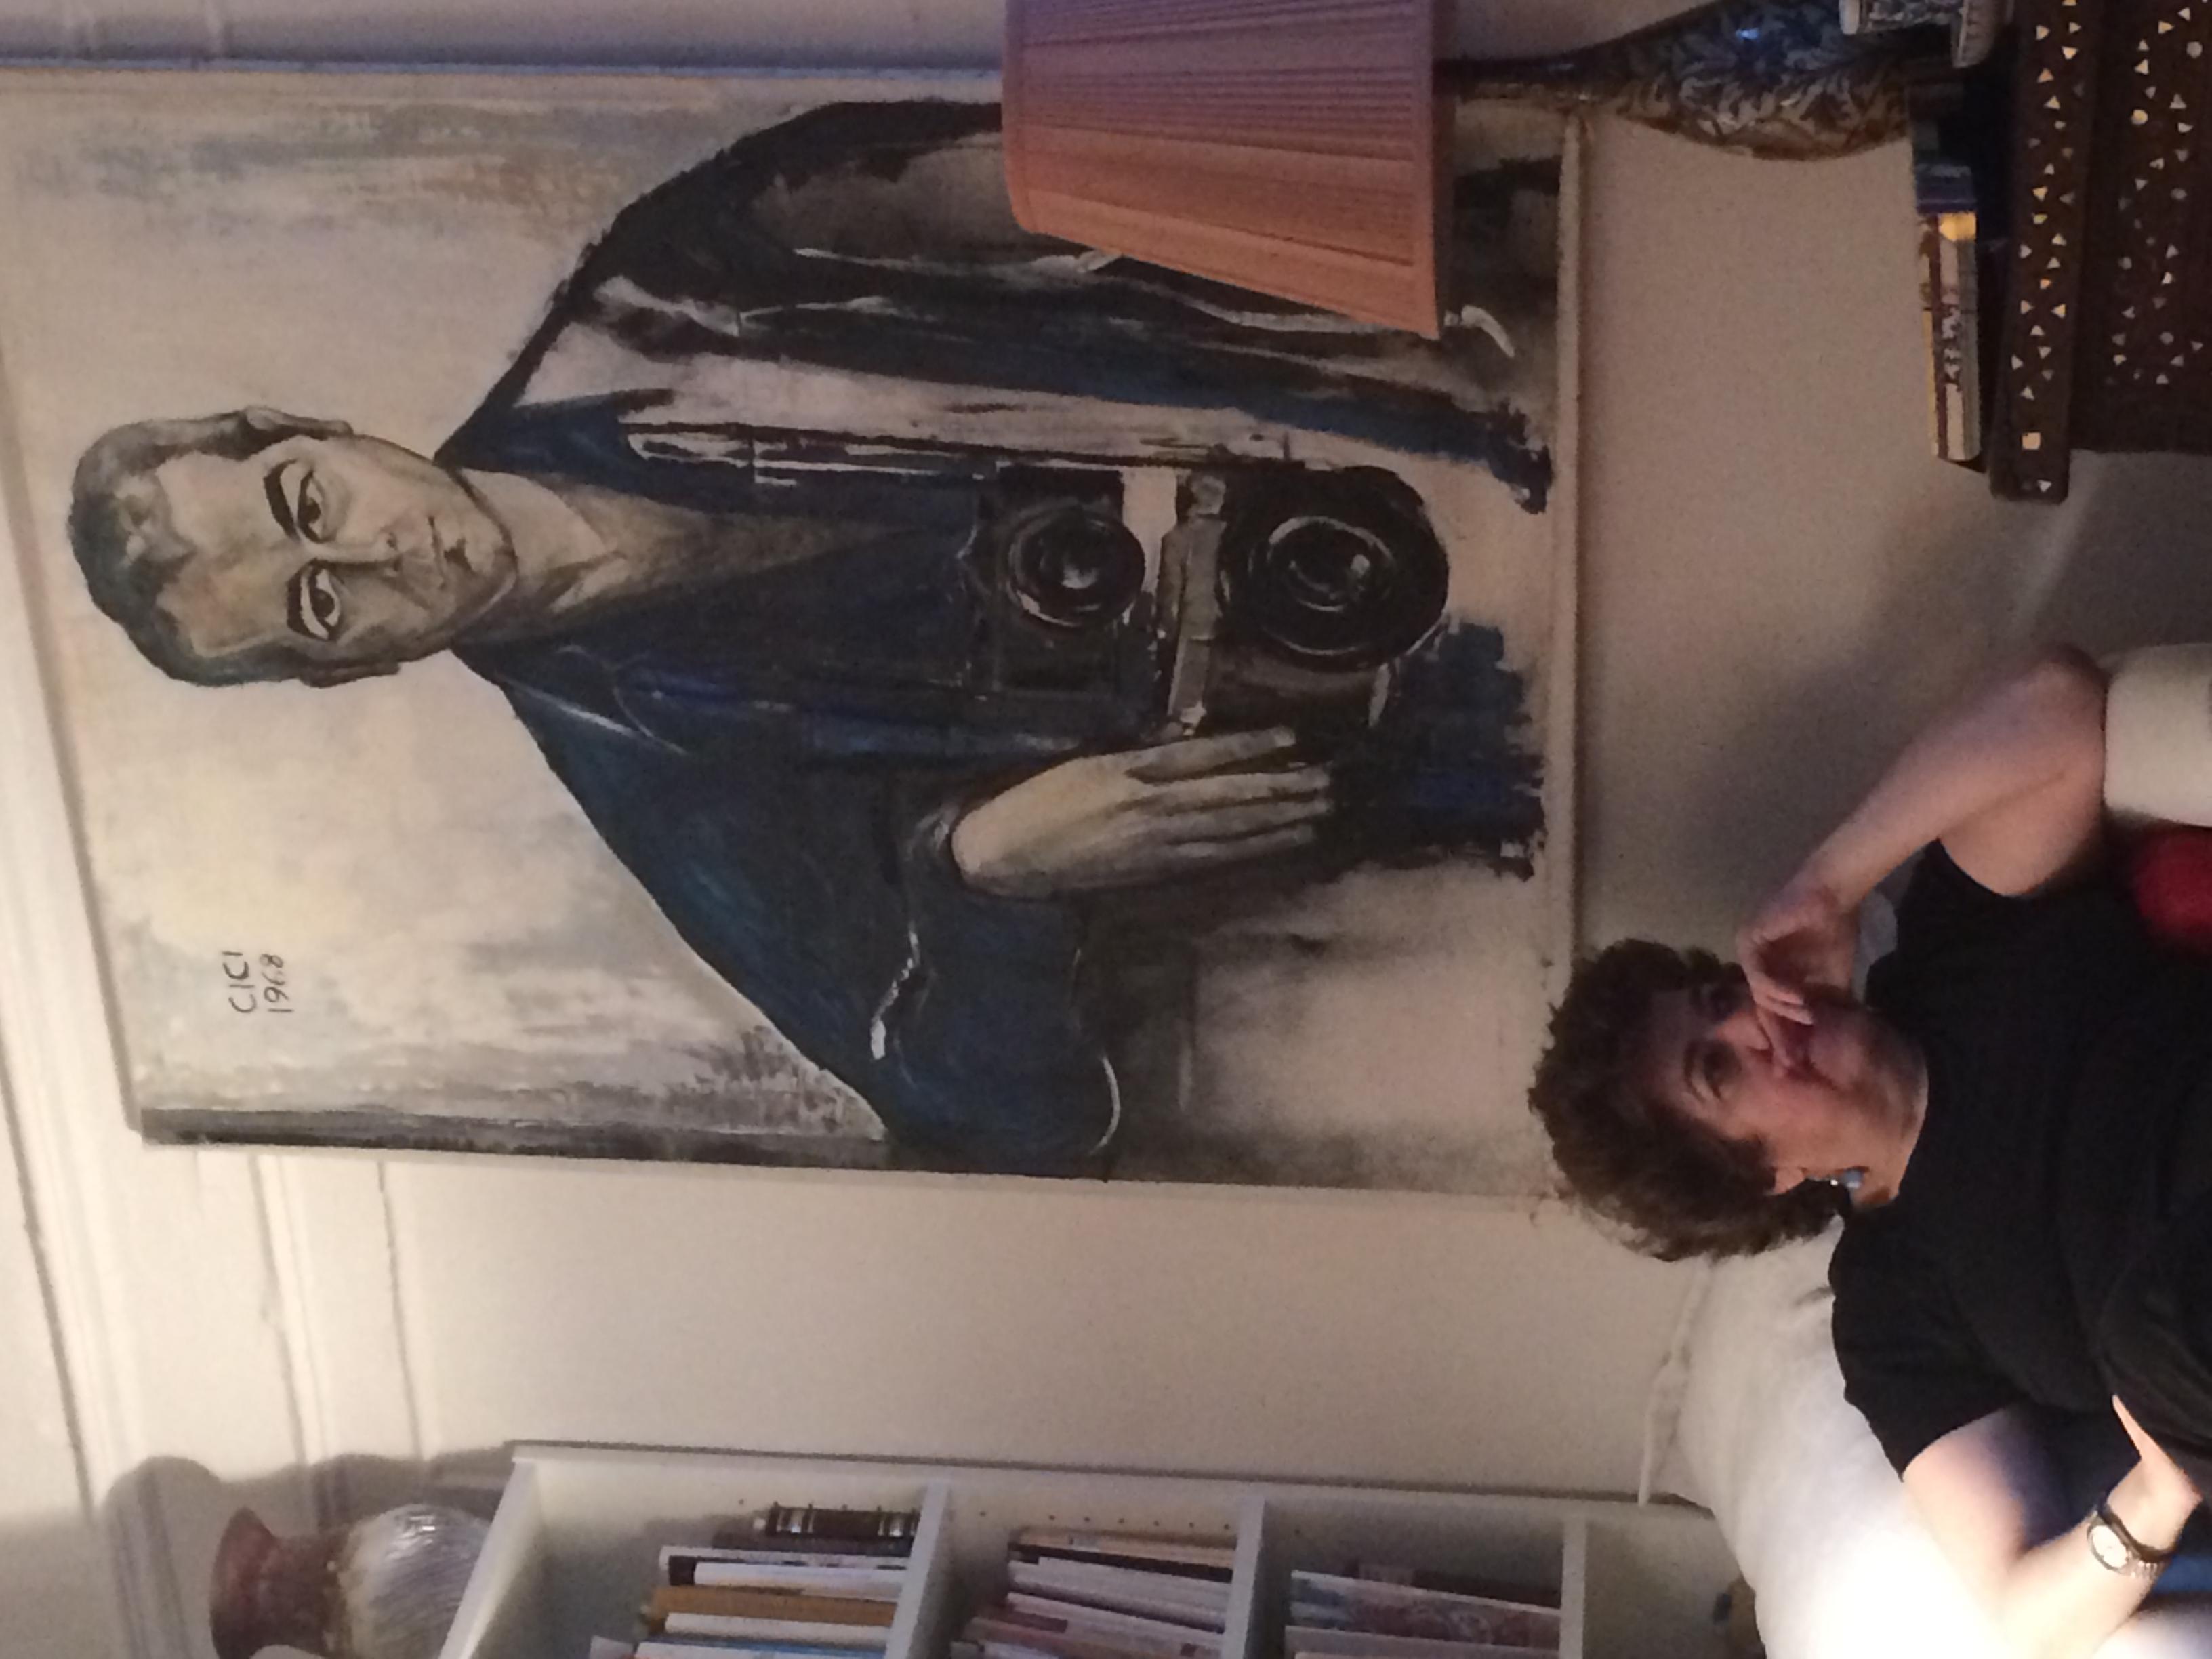 Lola Koundakjian, sits beneath a portrait of her father in her New York City home. Photo courtesy of Koundakjian.